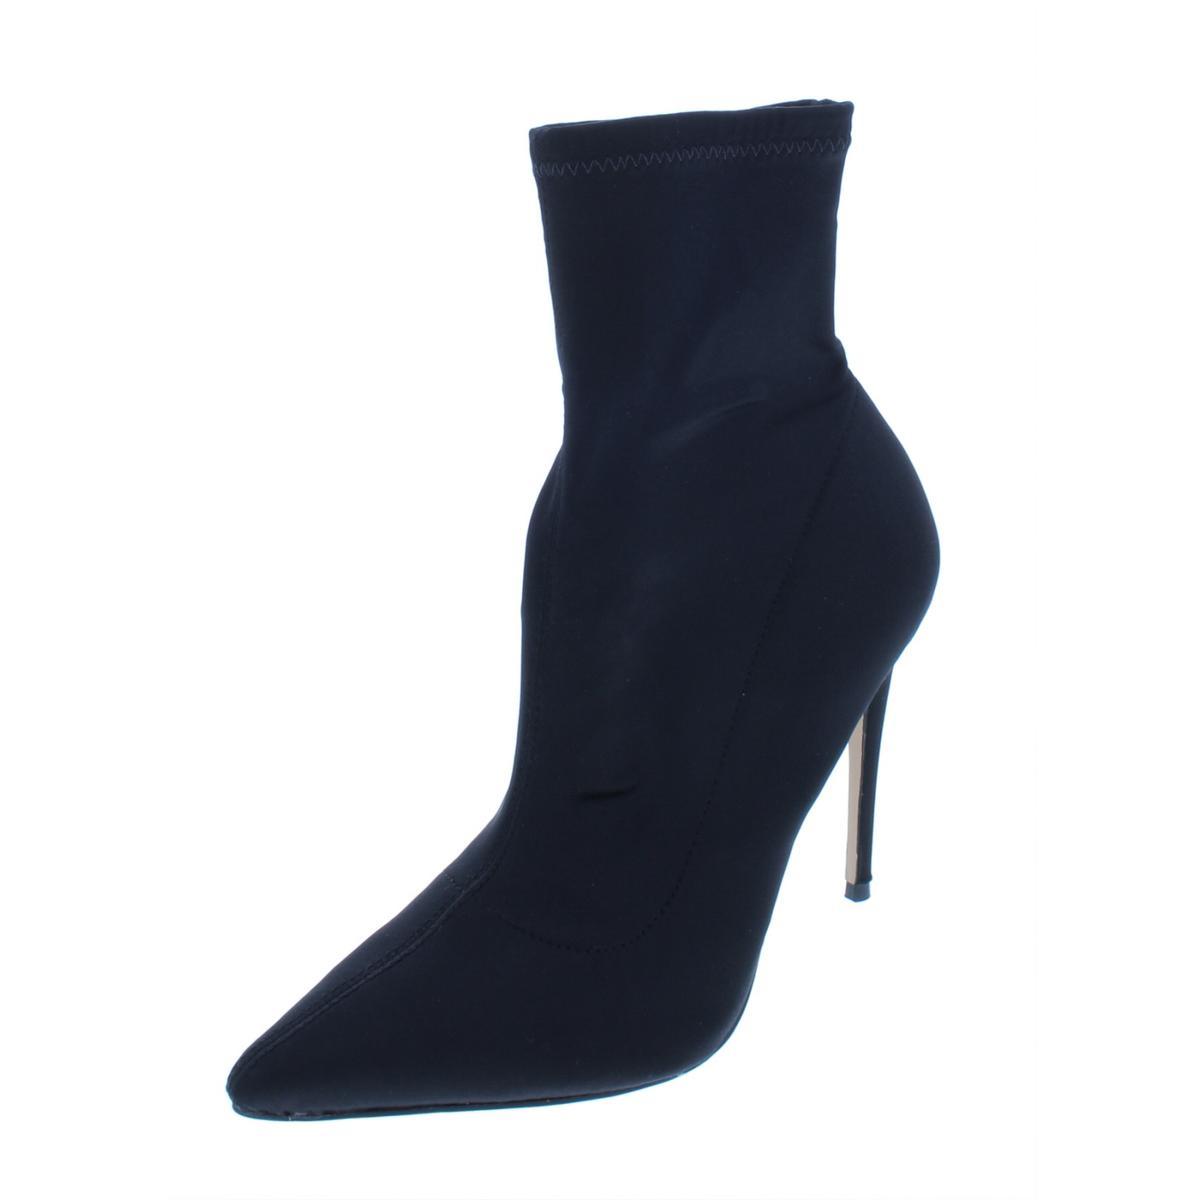 Aldo Damenschuhe Stiefel Cirelle Satin Pointed Toe Dress Mid-Calf Stiefel Damenschuhe Schuhes BHFO 3259 9ffb9a